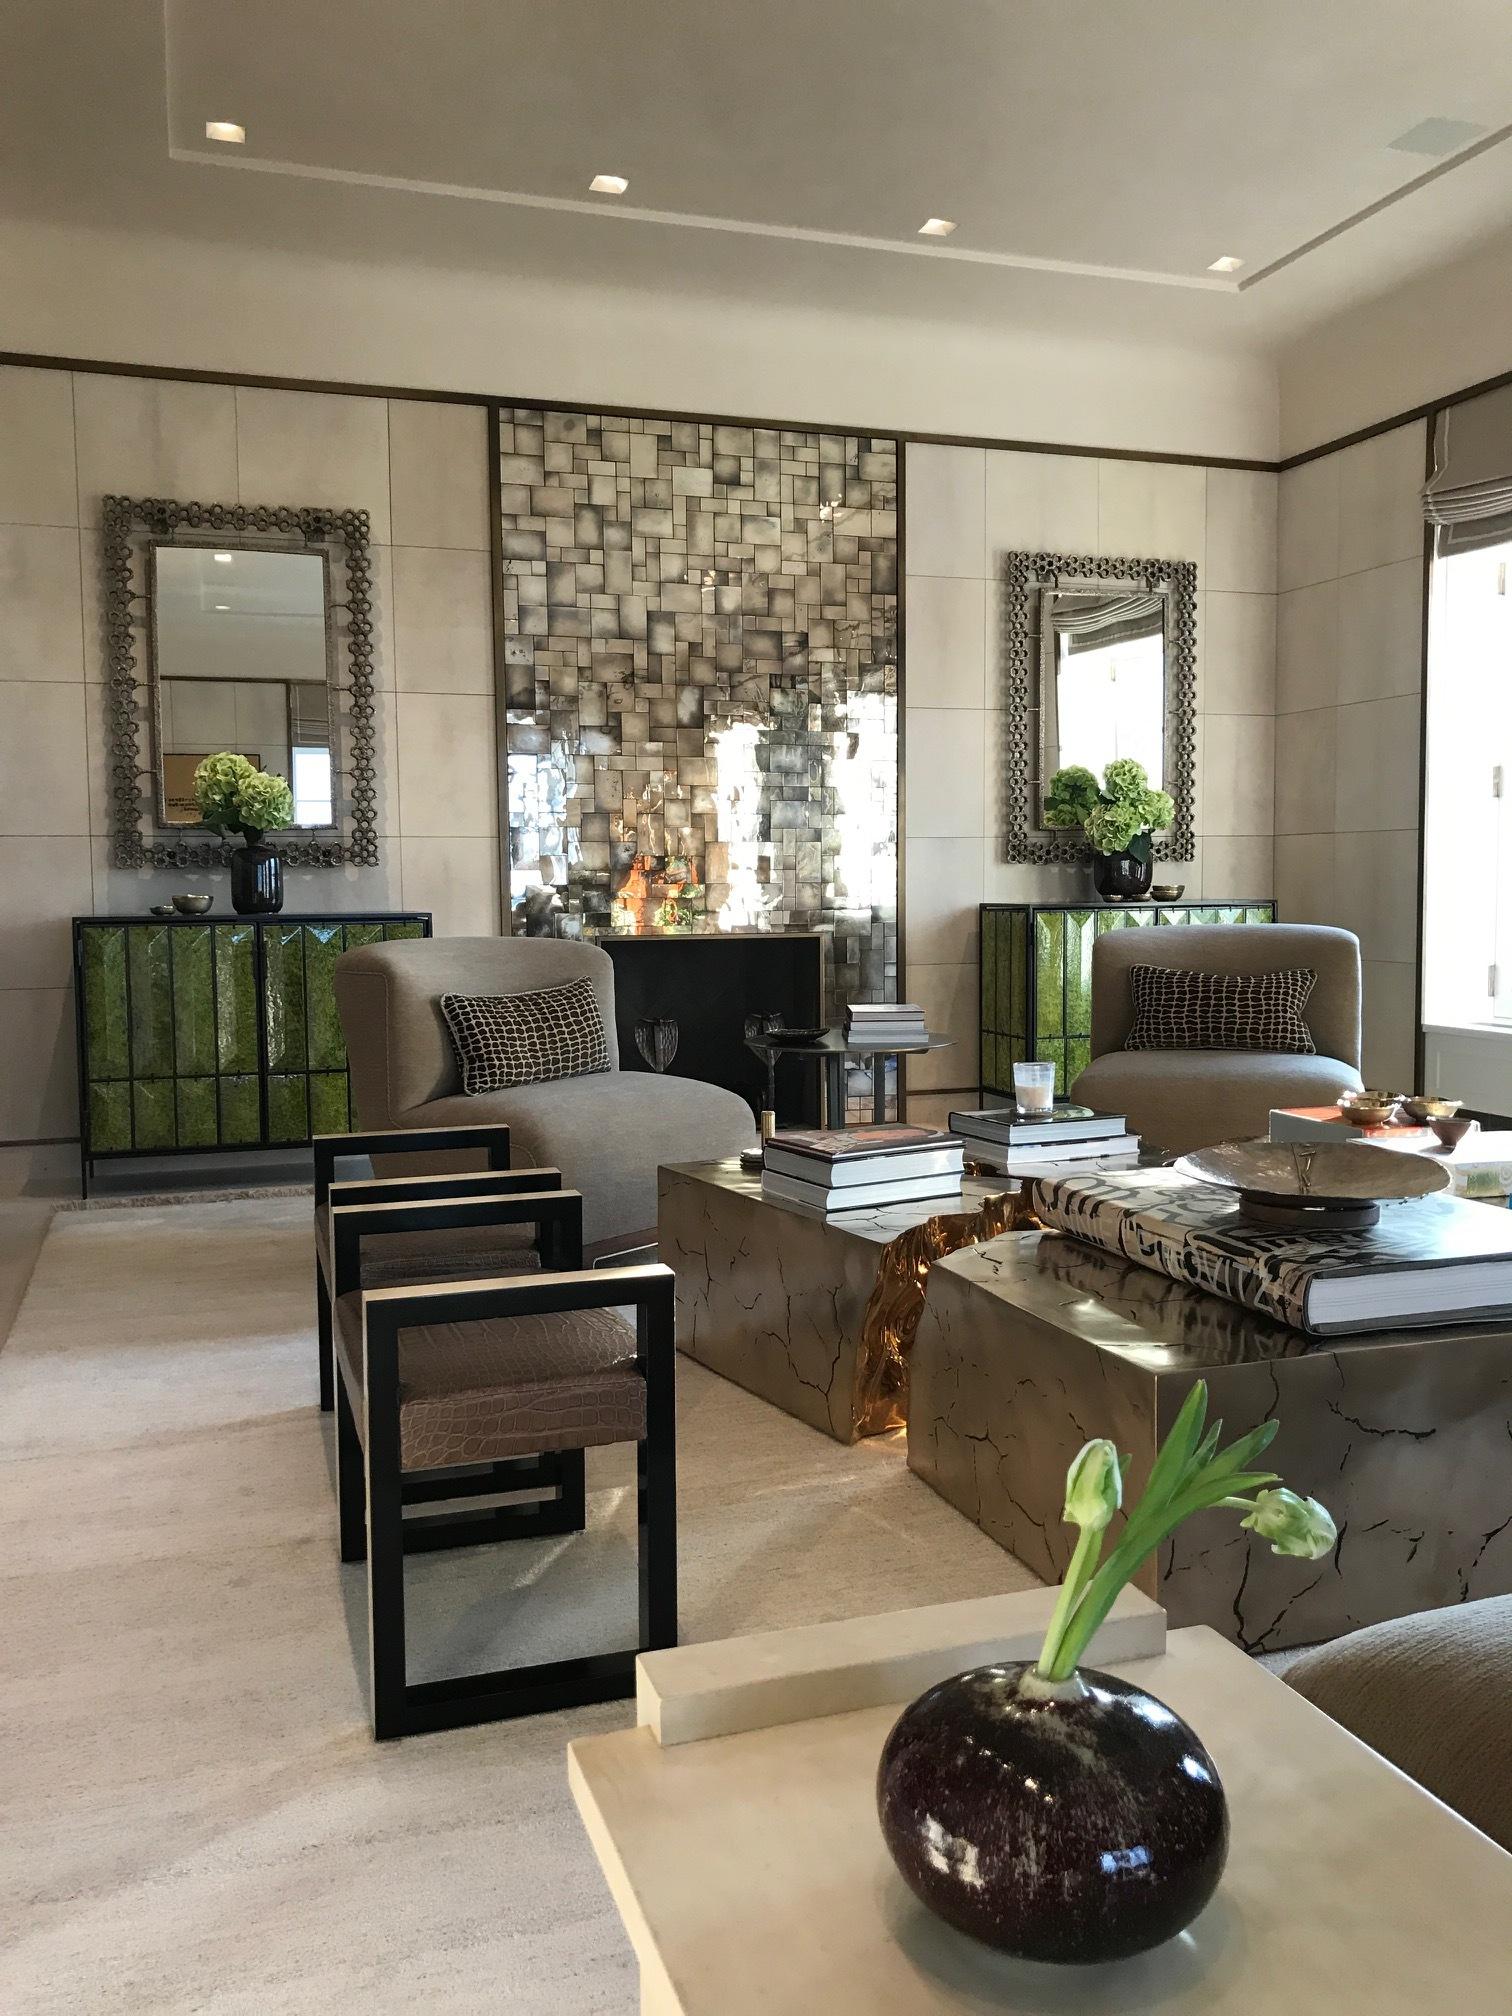 091517 Leather Floor Apartment 12.JPG